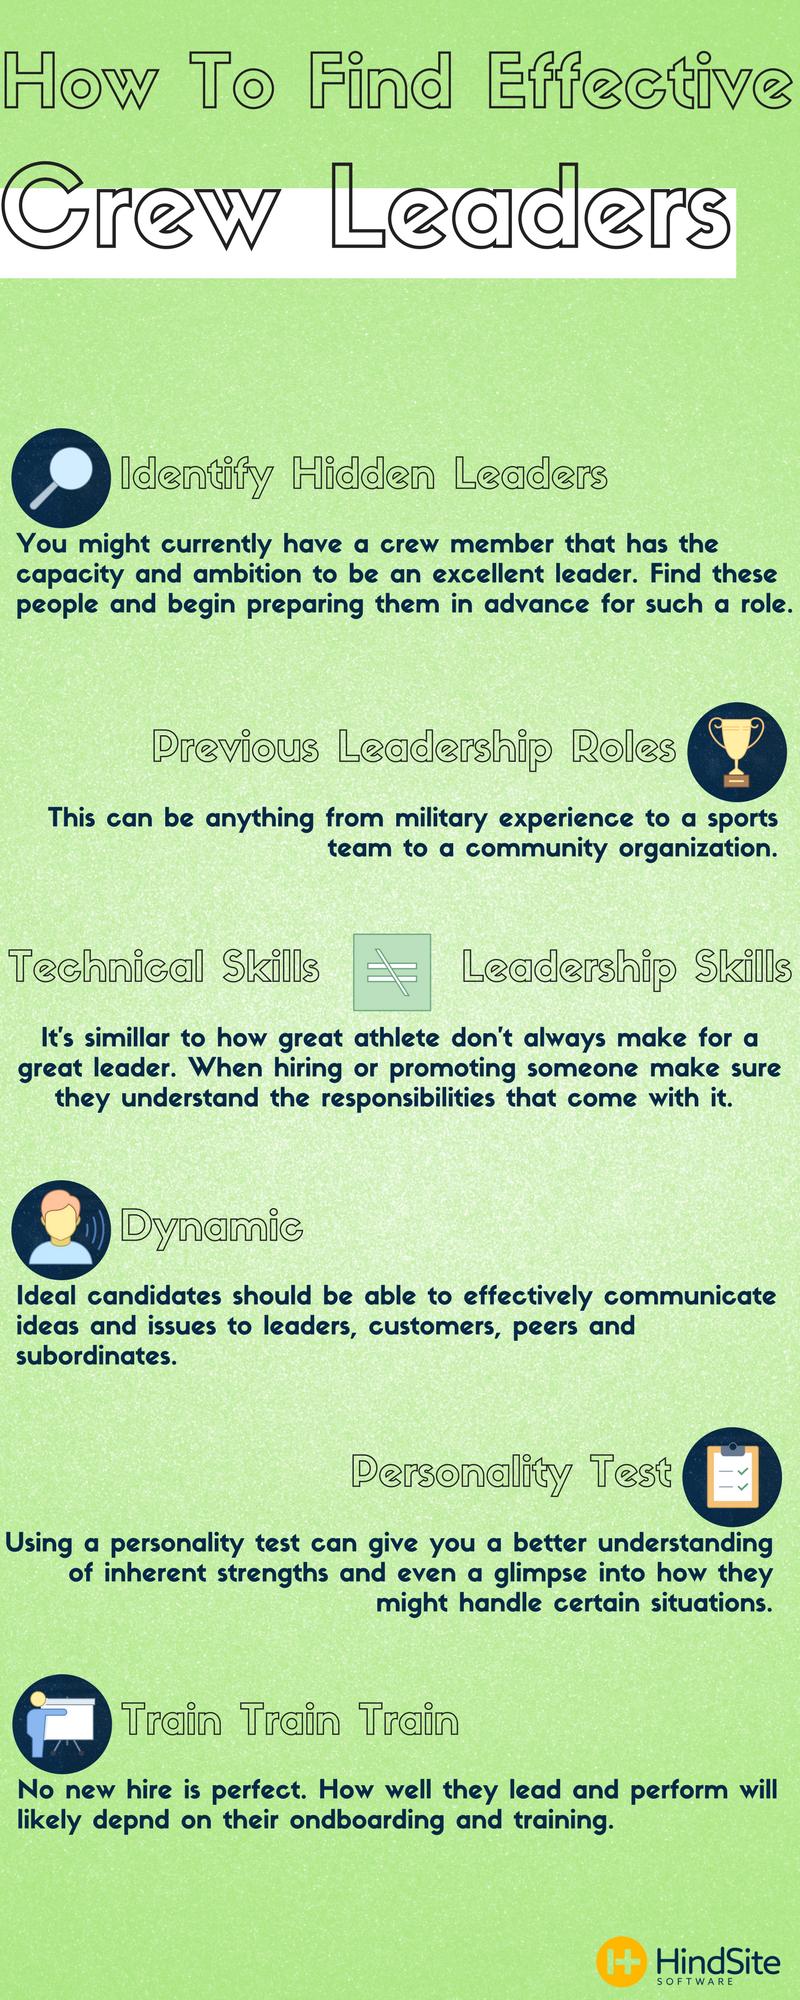 Identify Hidden Leaders.png